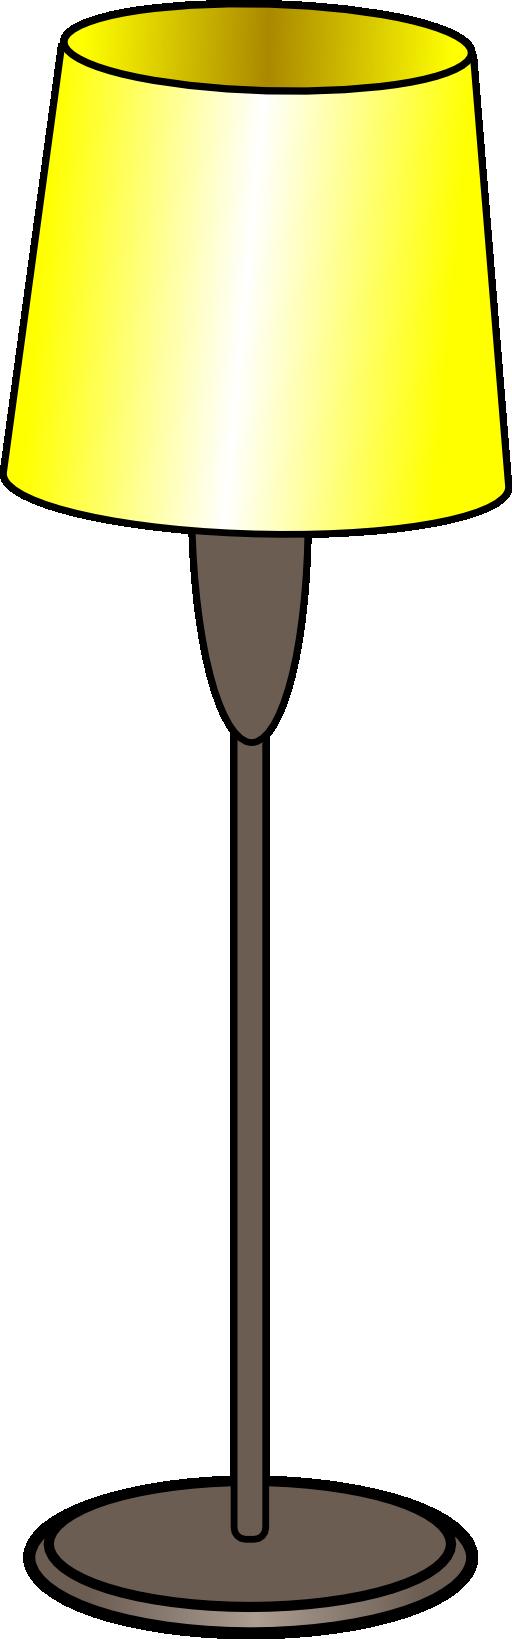 512x1639 Clipart Of Lamp Black Silhouette Free Clip Art Lemonize